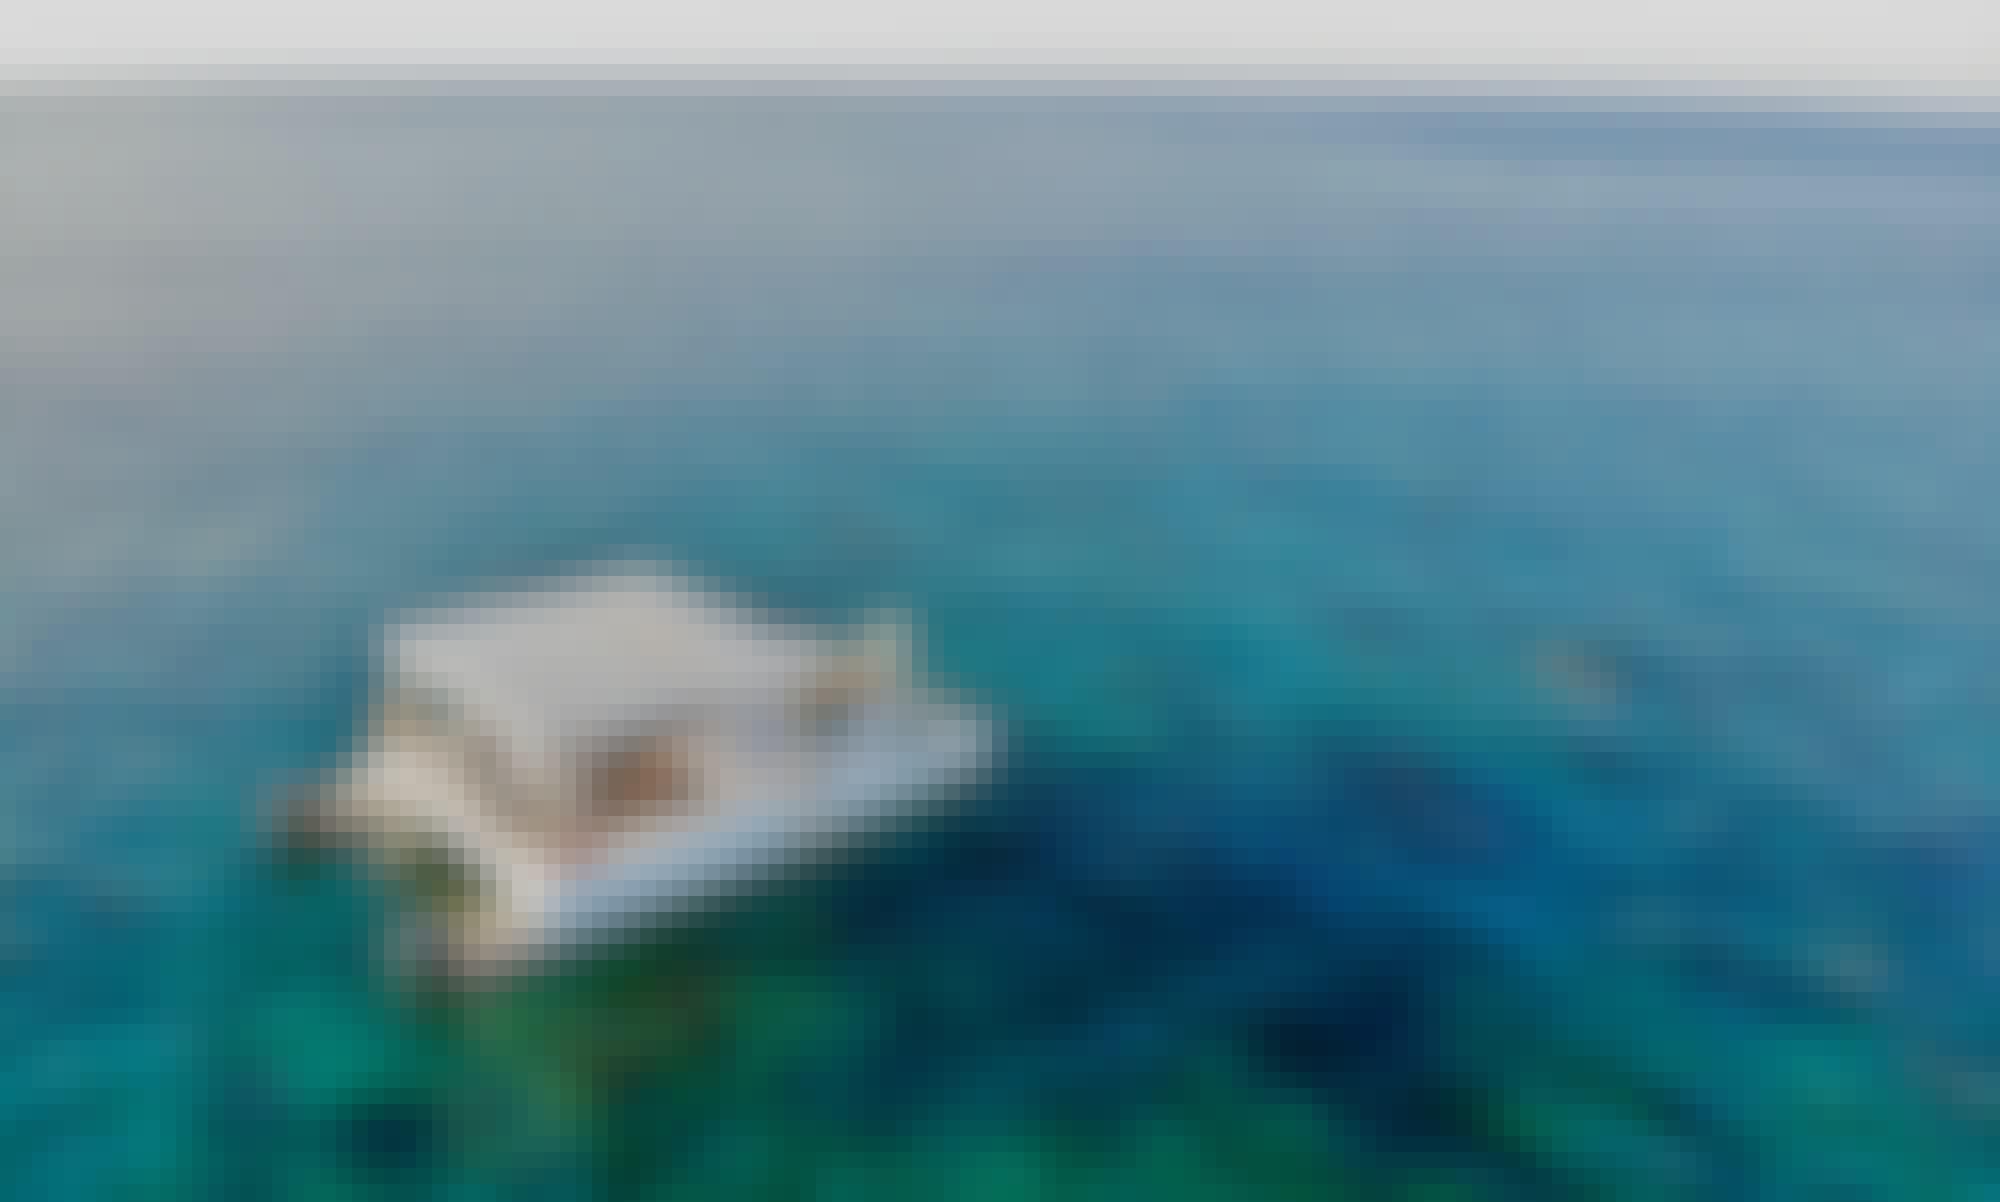 Explore the Treasures of Turks & Caicos  with 30' Custom Catamaran in Leeward Settlement